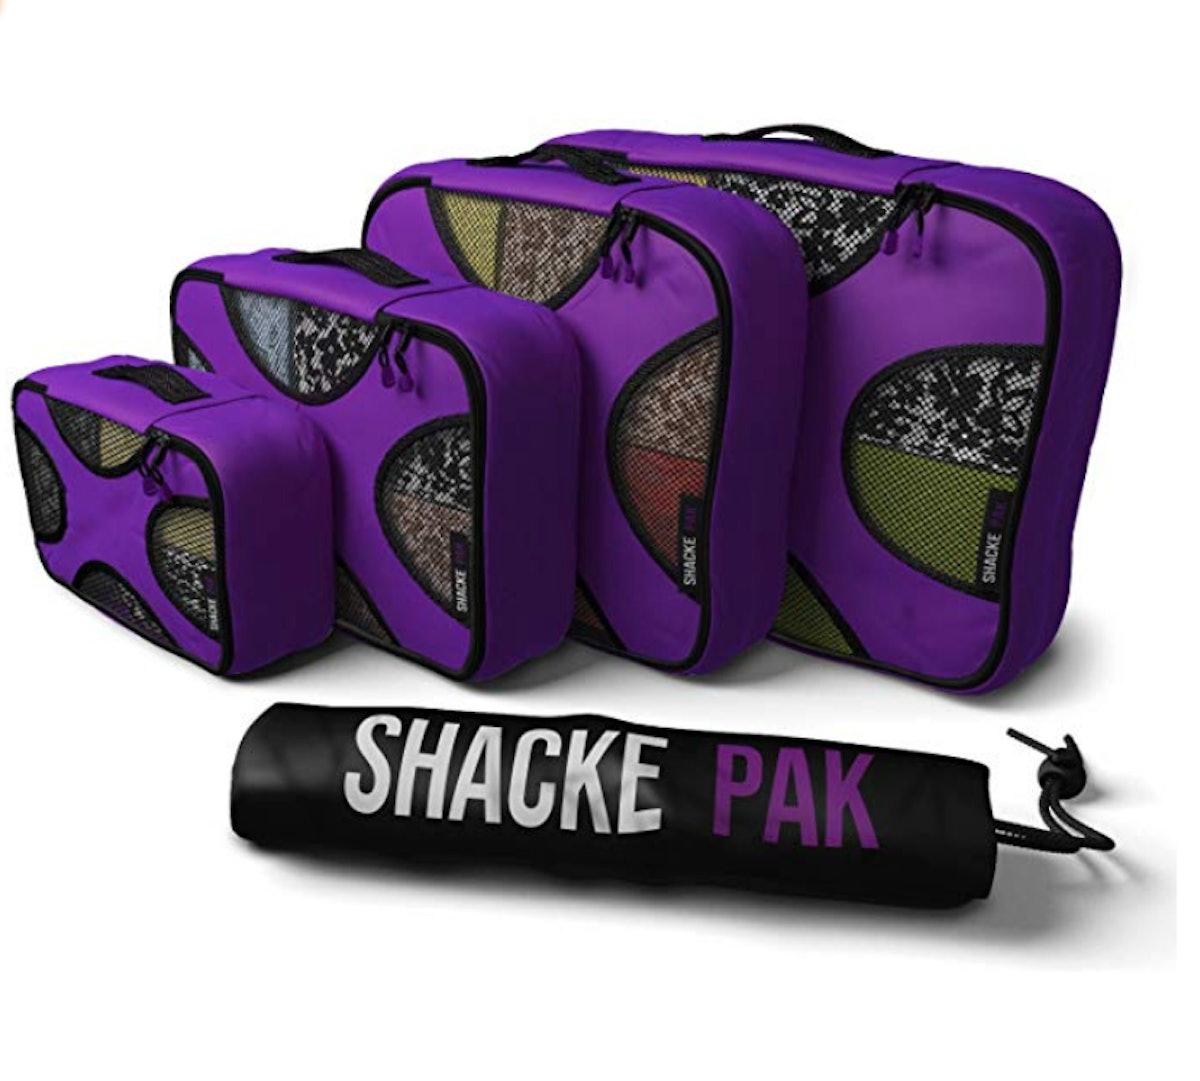 Shacke 4-set Packing Cubes